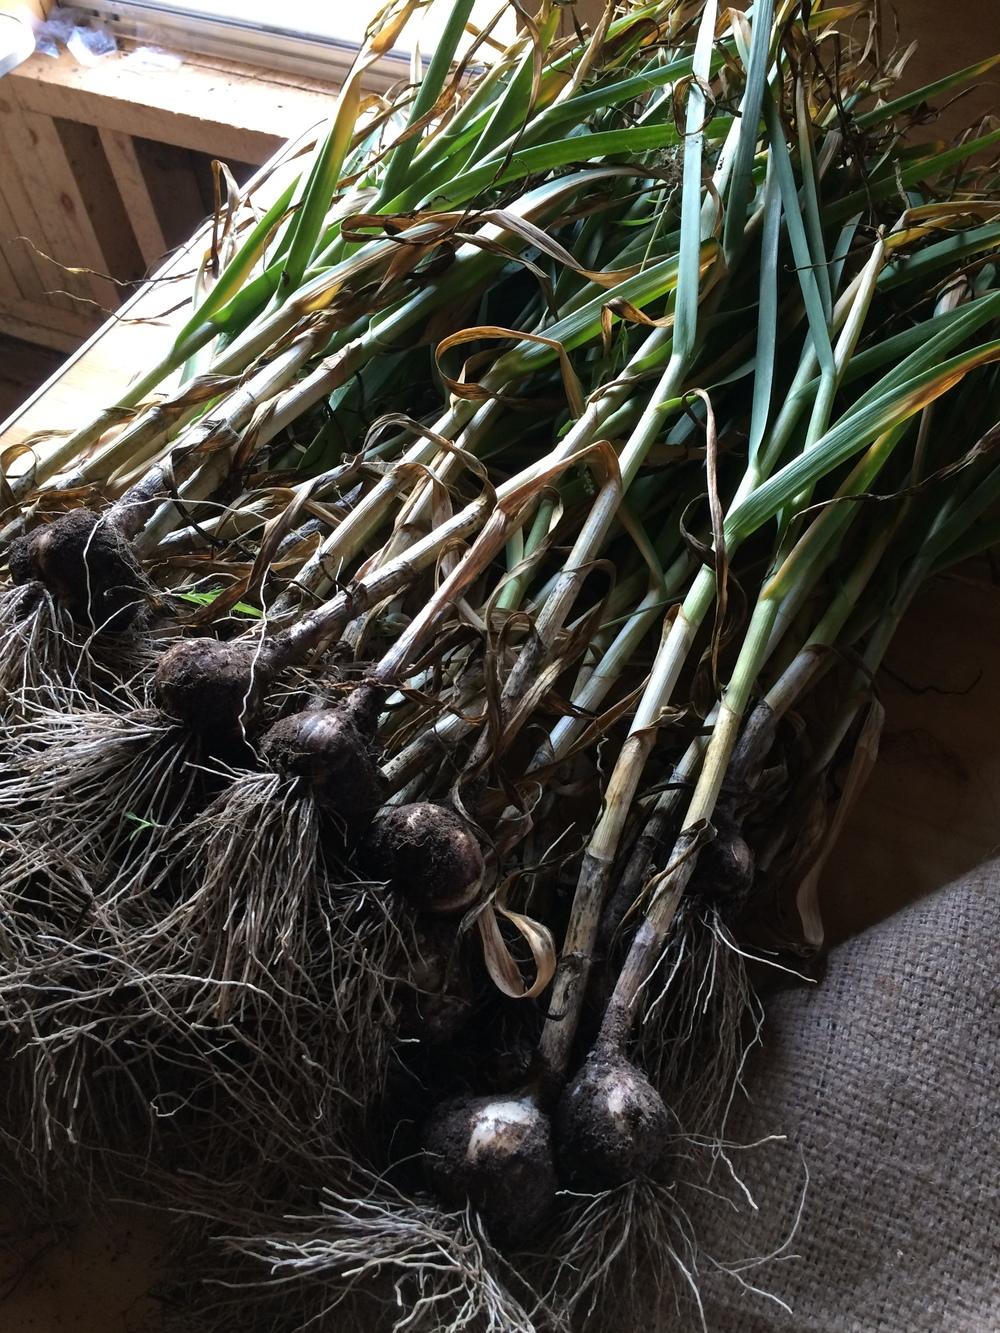 Cleaning Garlic